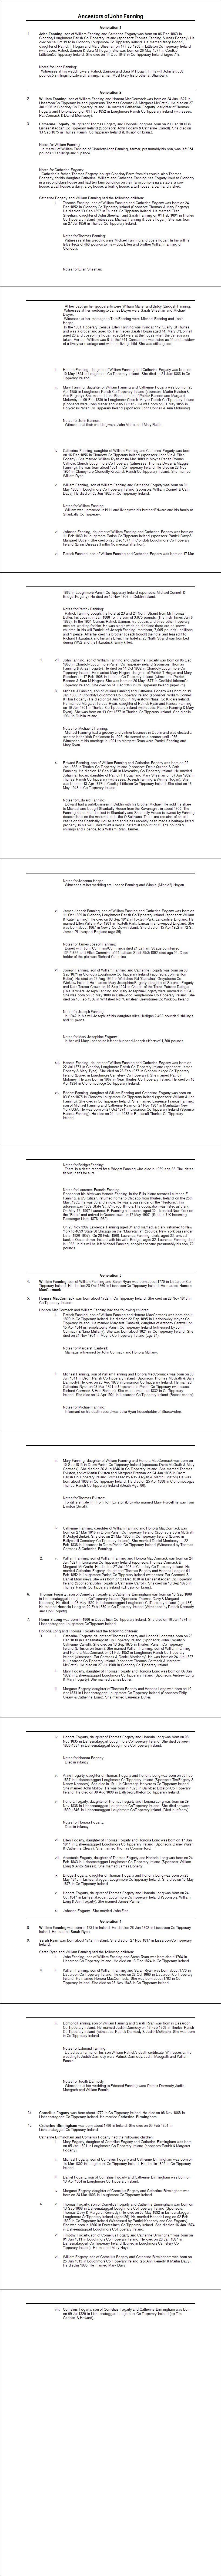 John Fanning Clondoty Ancestor Report 2015